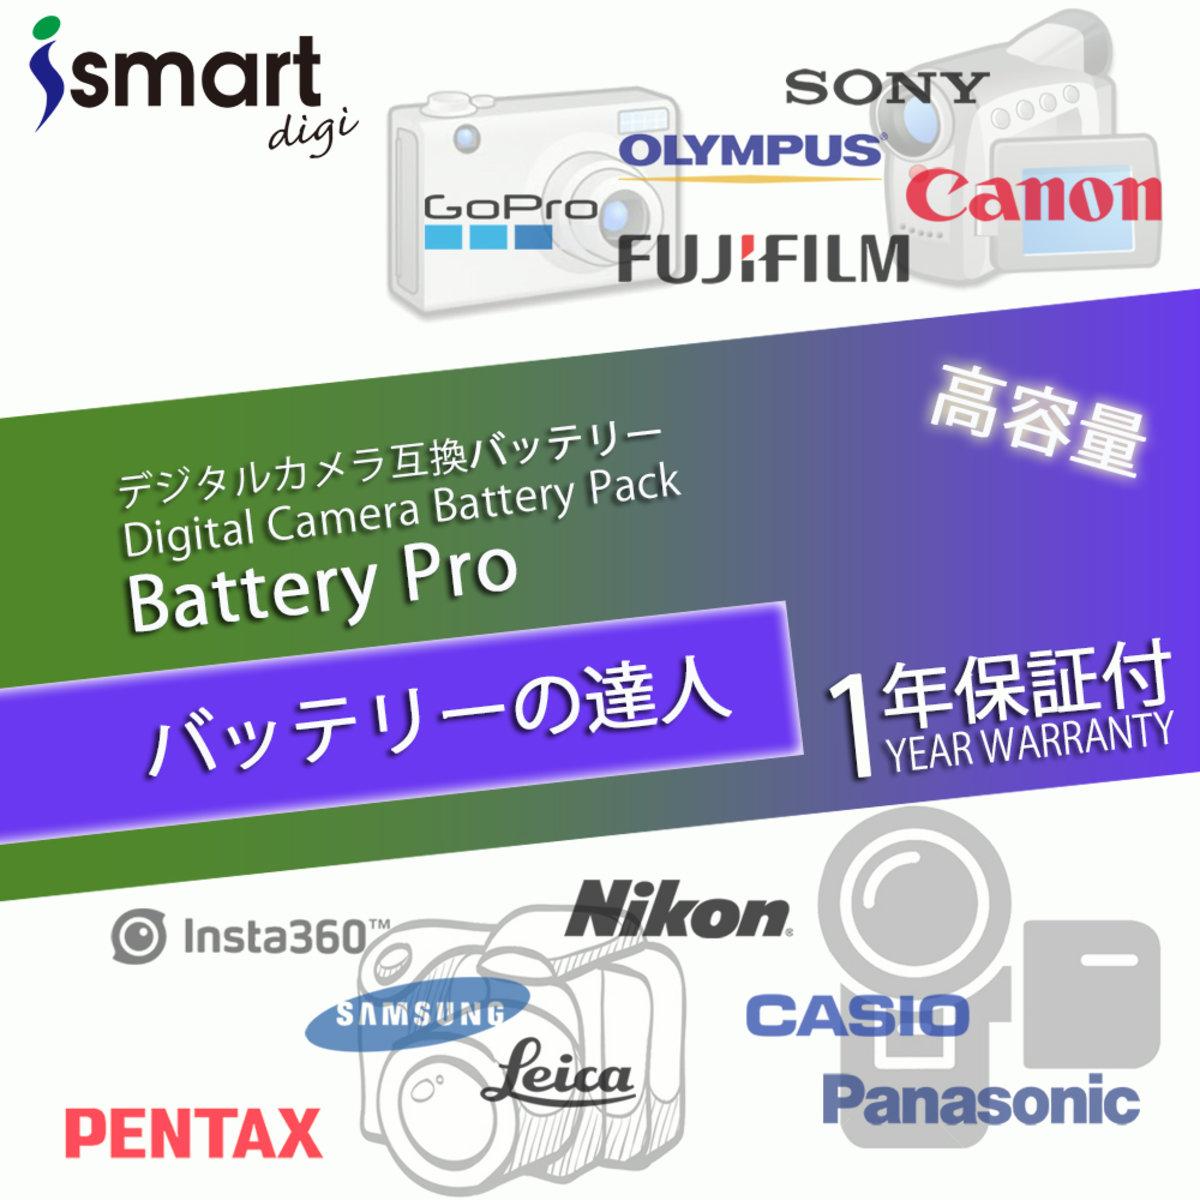 FujiFilm Digital Camera Battery (For:FinePix JV255 / JV200 / JV205 / JV150 / JV100 / JV105 / J250 / J120 / J110w / J100)